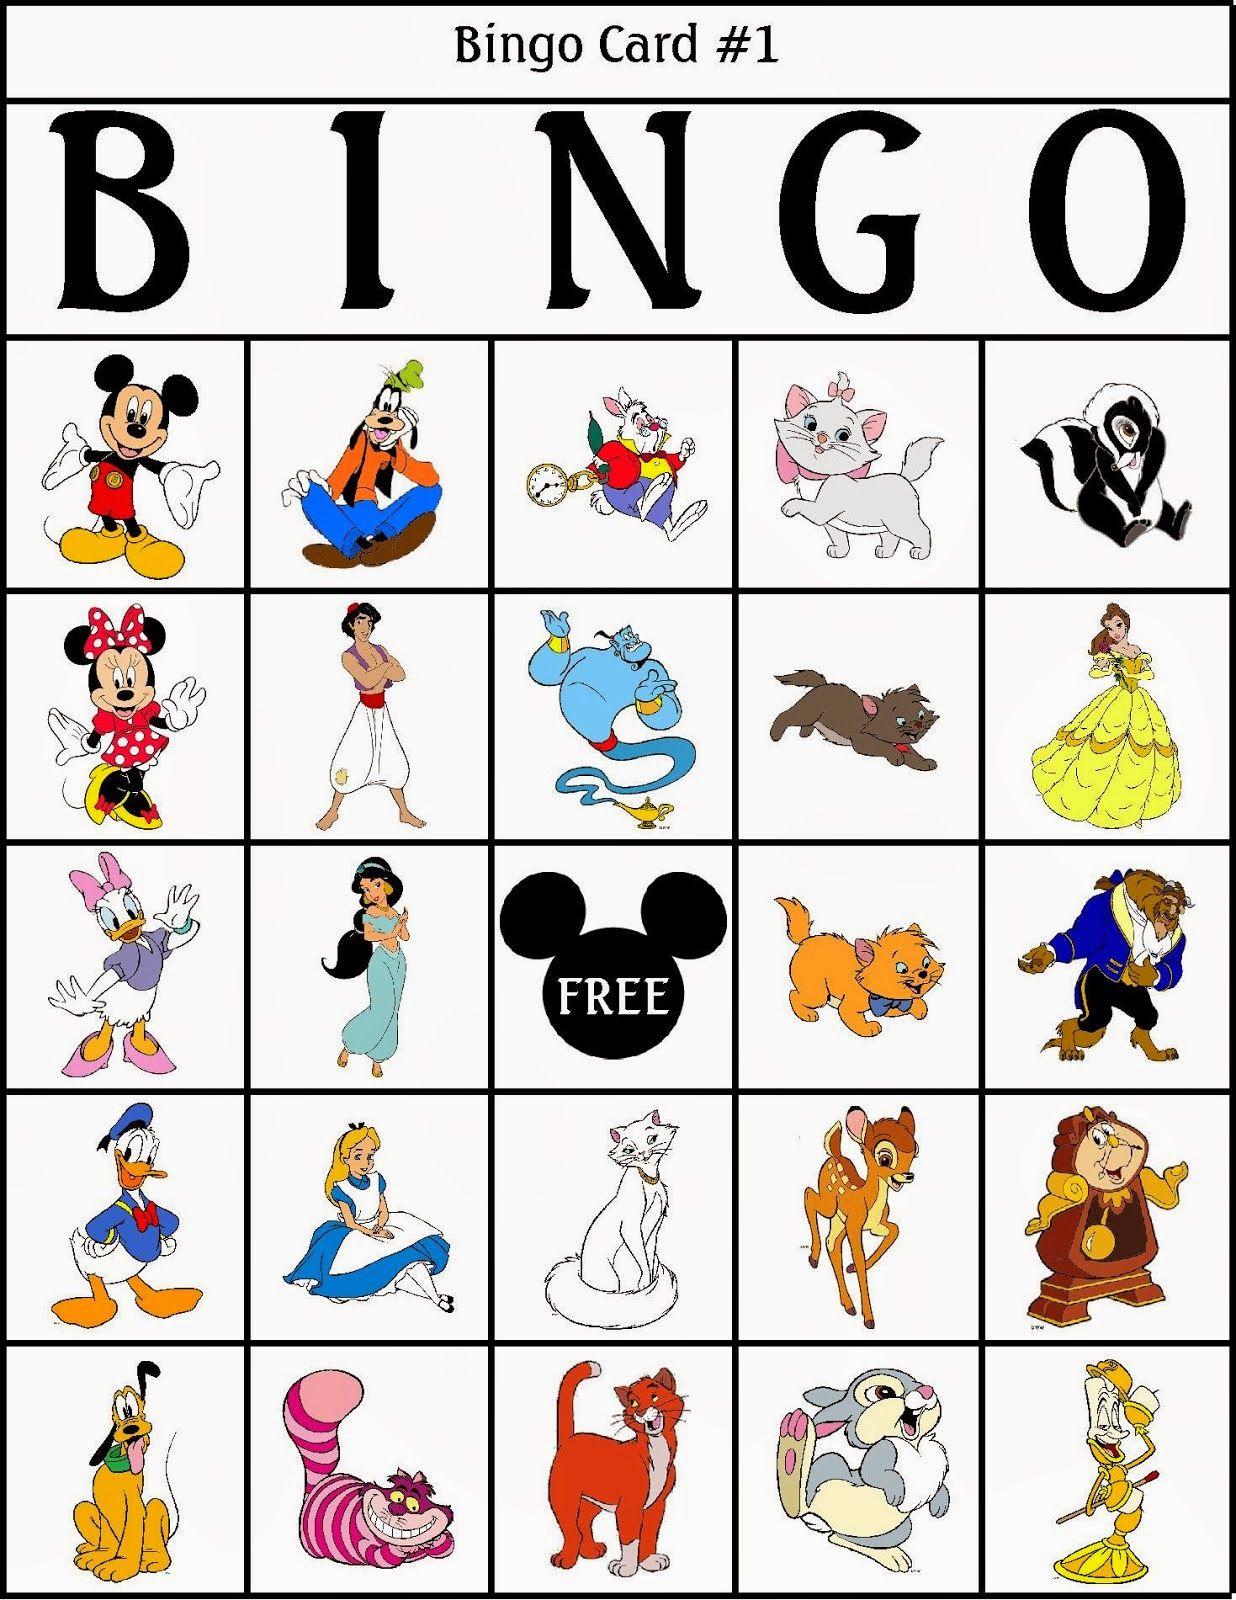 Gratis Backgamon bingo ortiz juego-105228